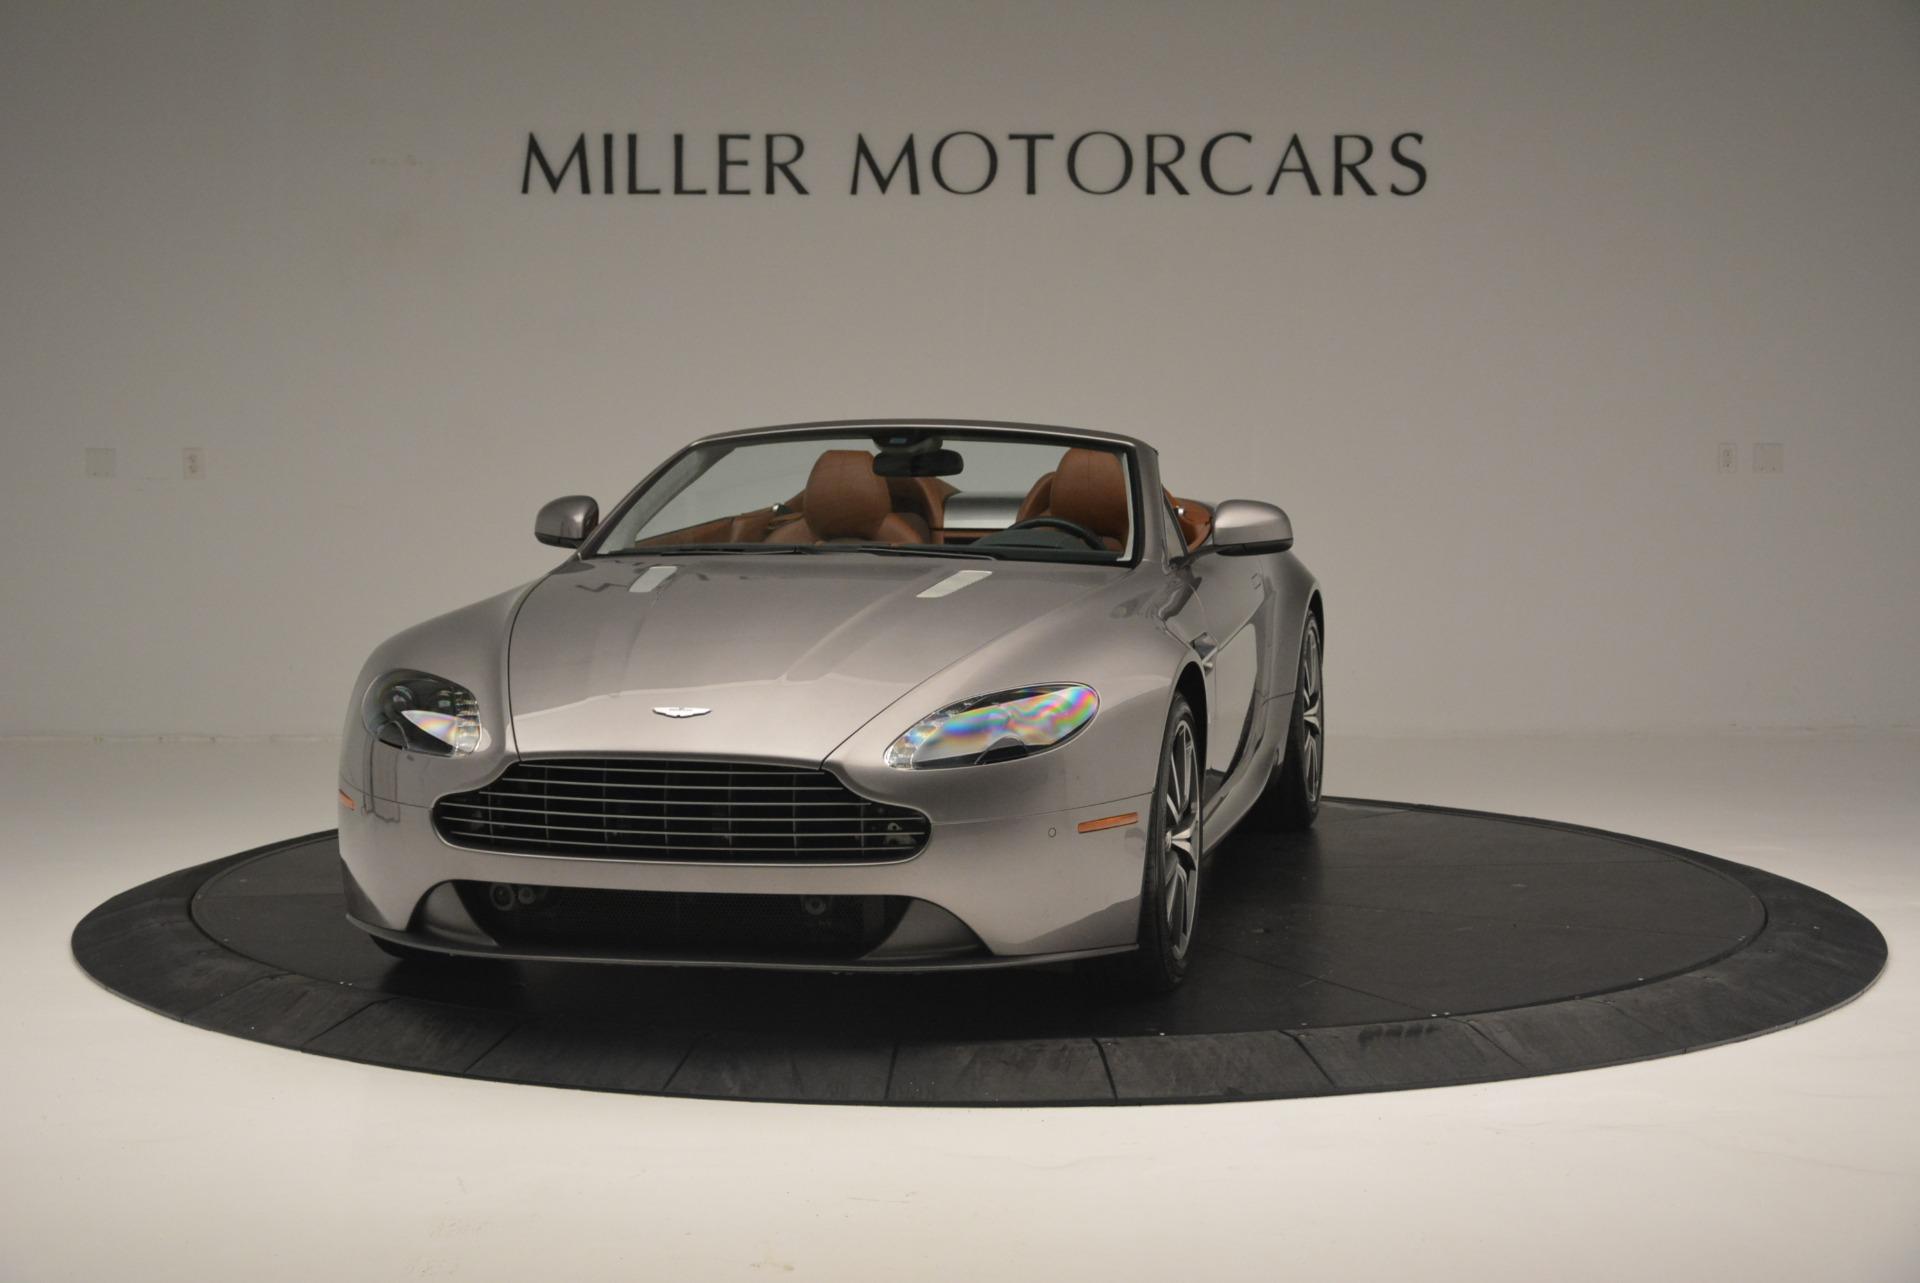 Used 2015 Aston Martin V8 Vantage Roadster For Sale In Greenwich, CT. Alfa Romeo of Greenwich, 7396 2463_p2